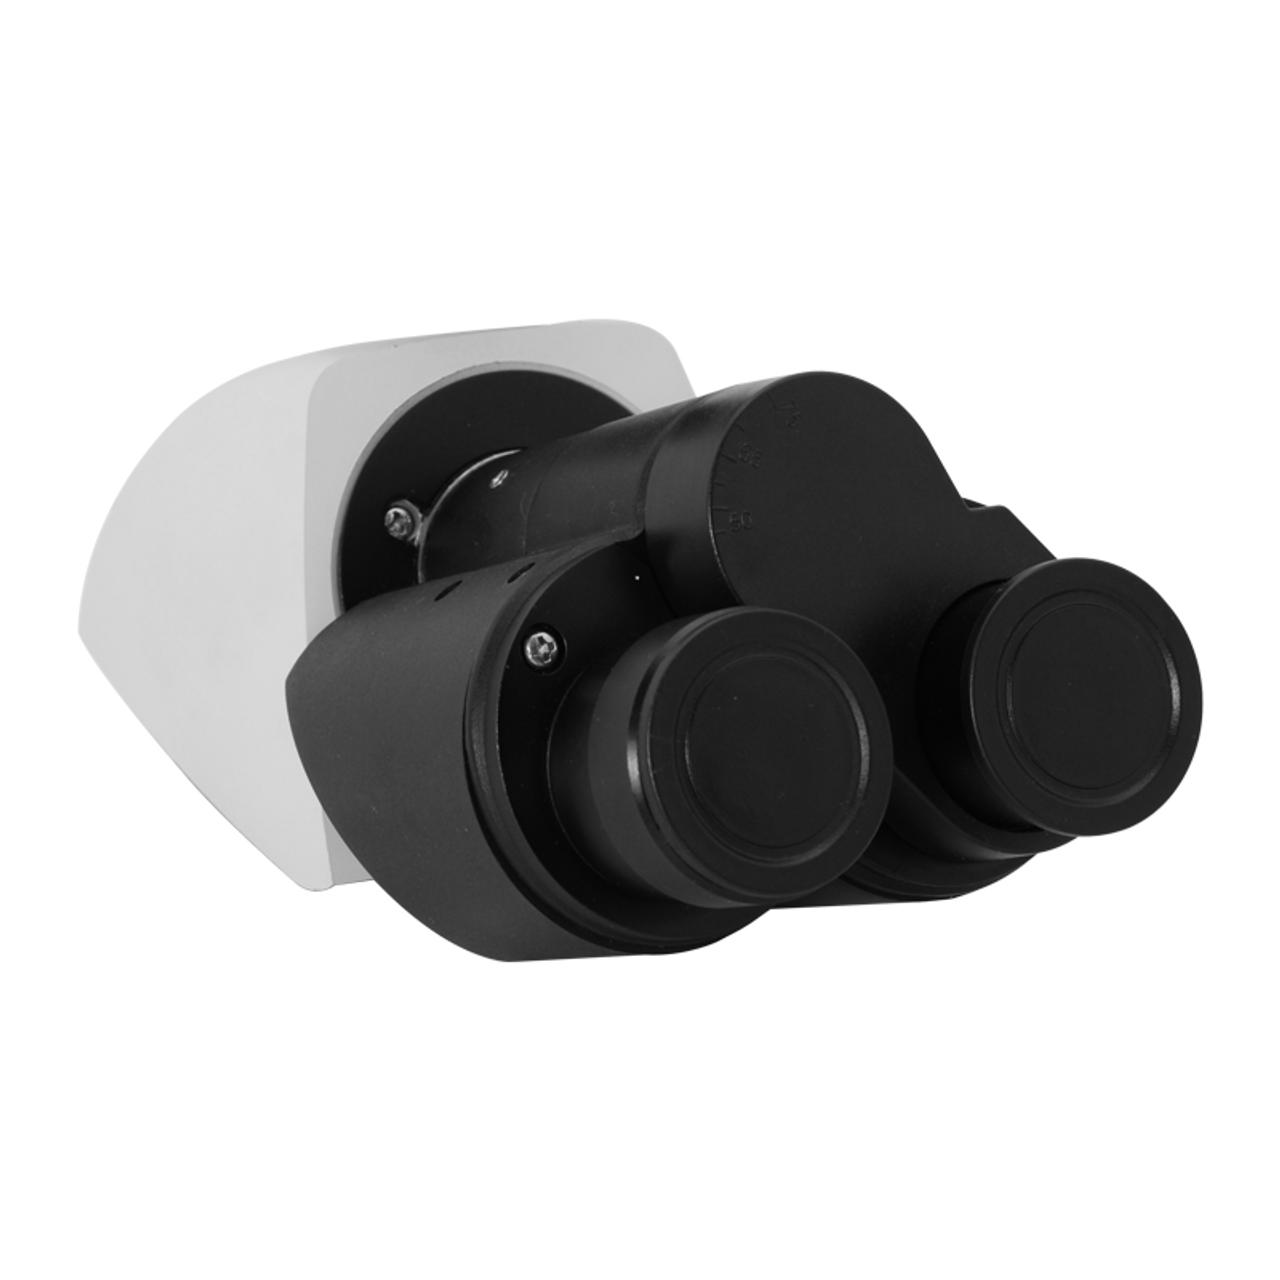 Infinite BM03021221 BoliOptics Binocular Compound Microscope Eyepiece Body Tube Eyetube Angle 30 Degrees